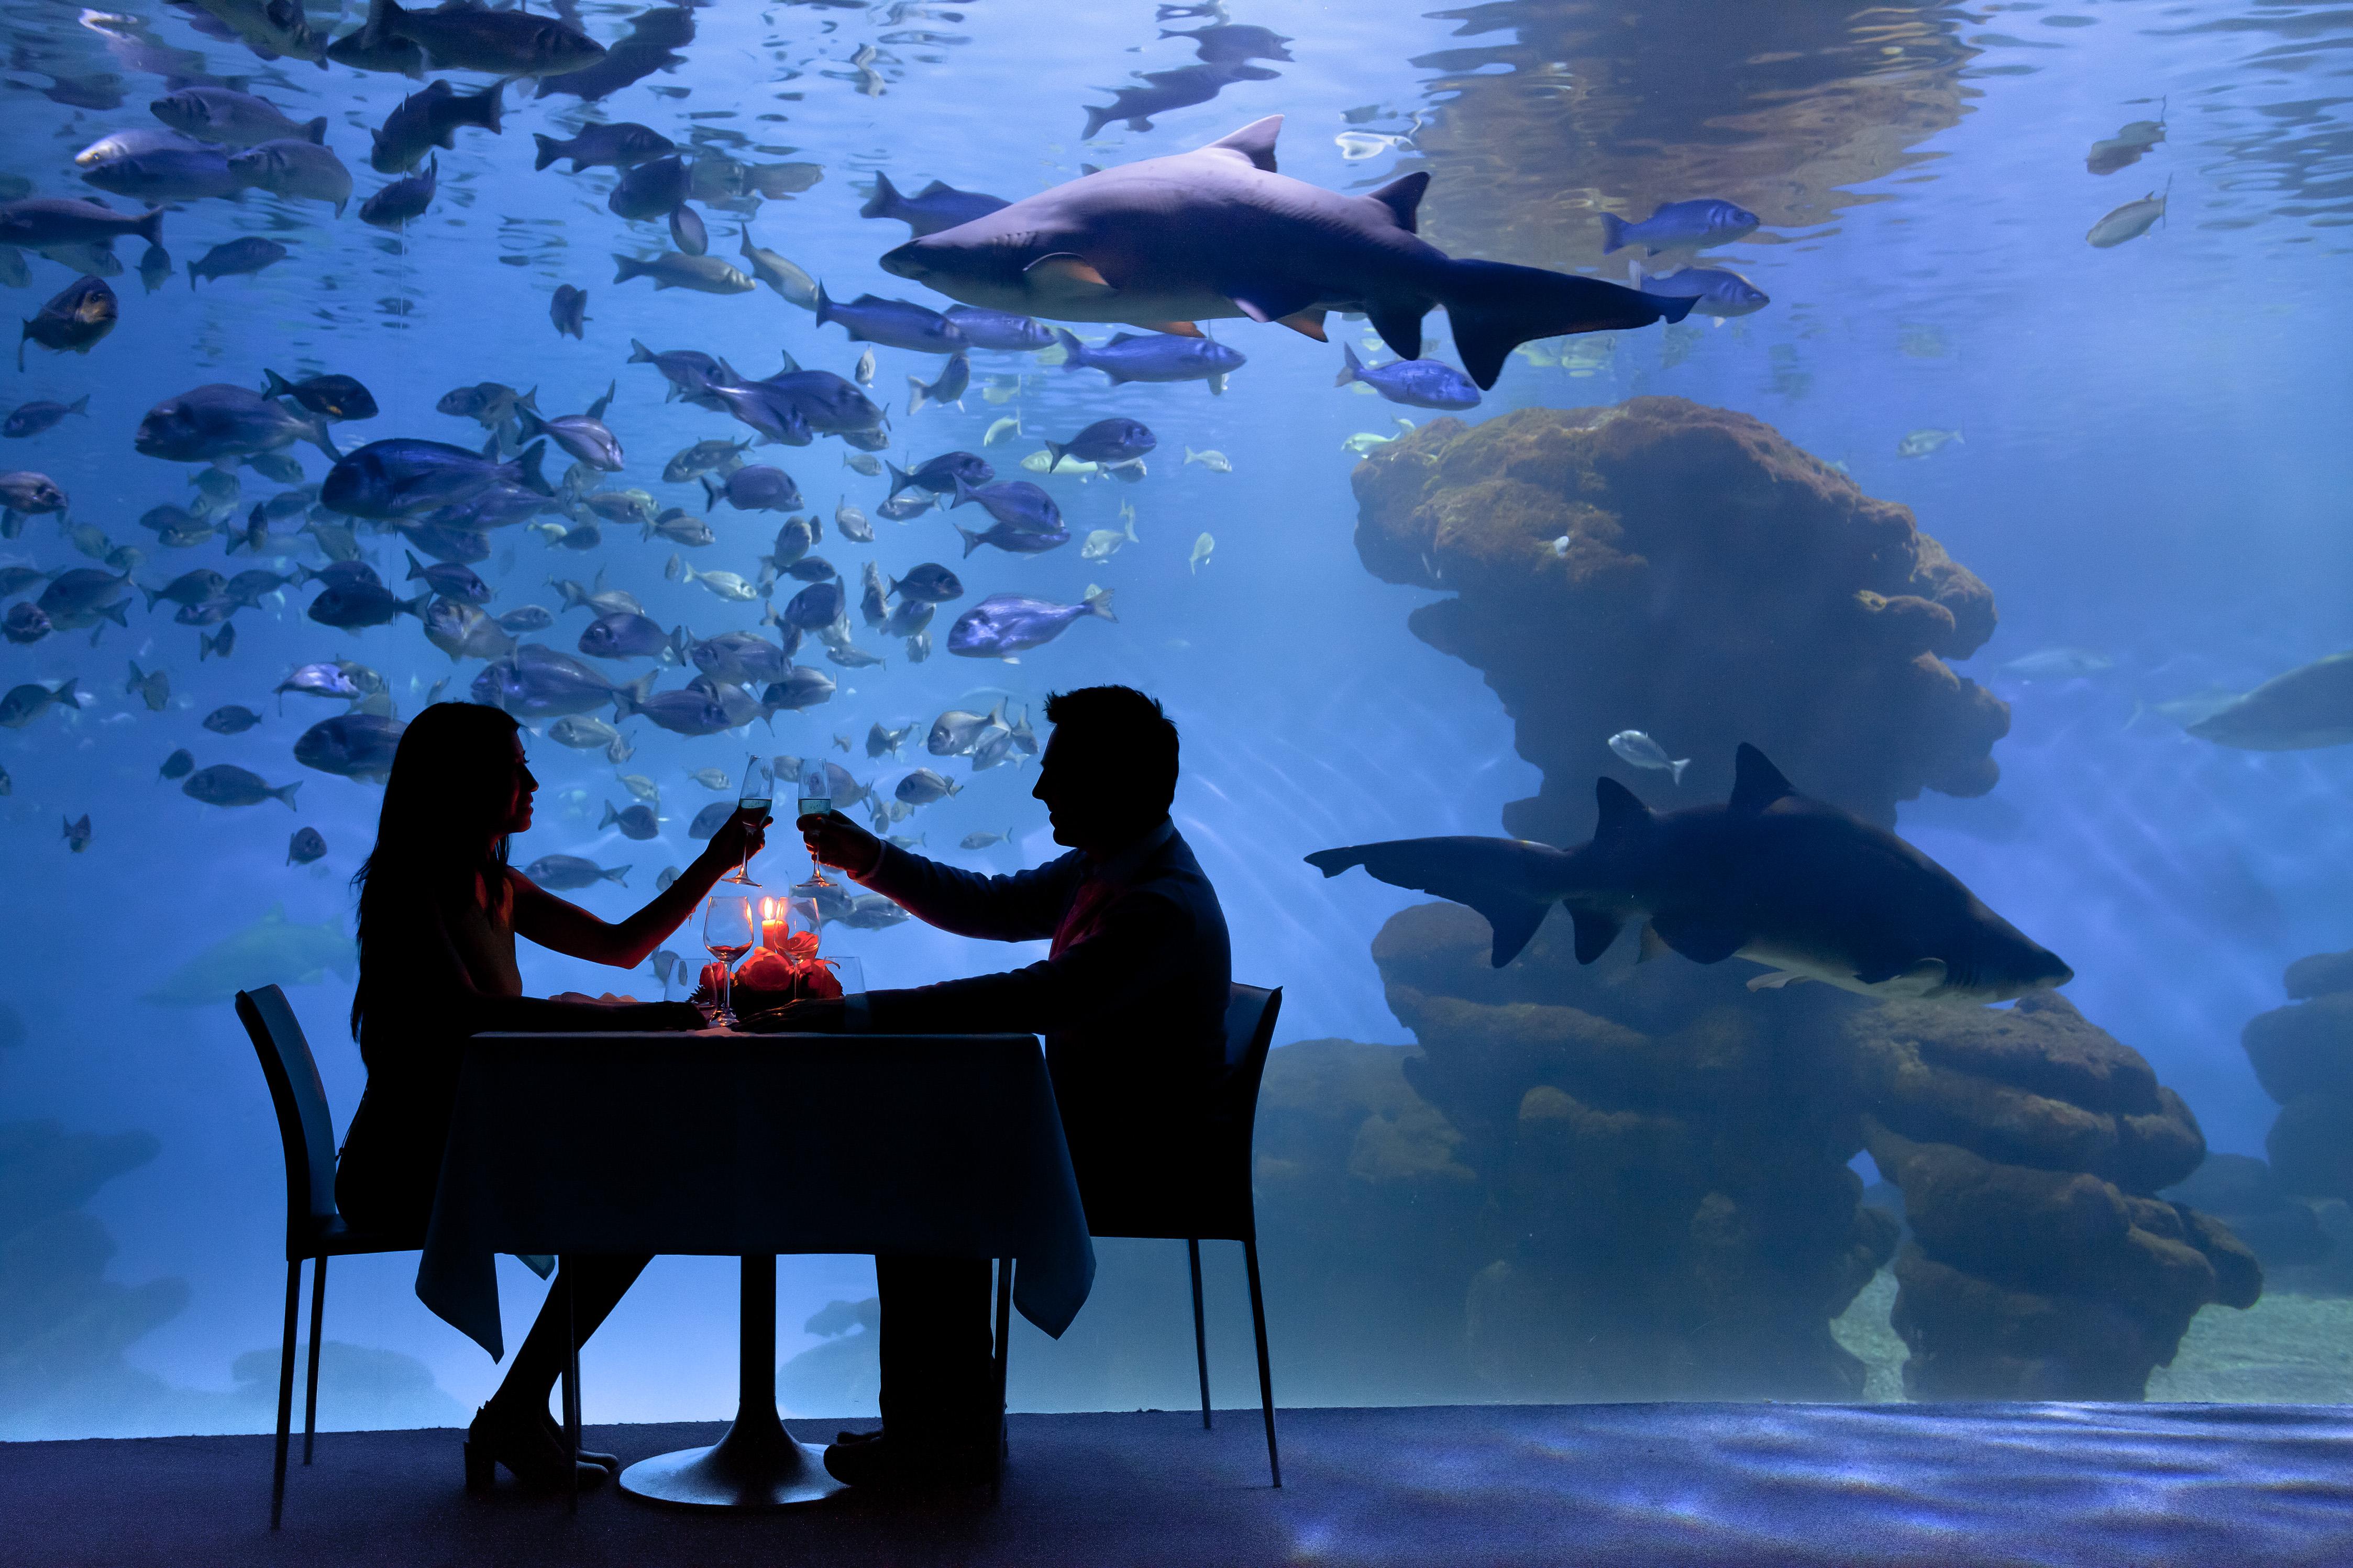 File:Palma Aquarium - Cena con tiburones.jpg - Wikimedia Commons